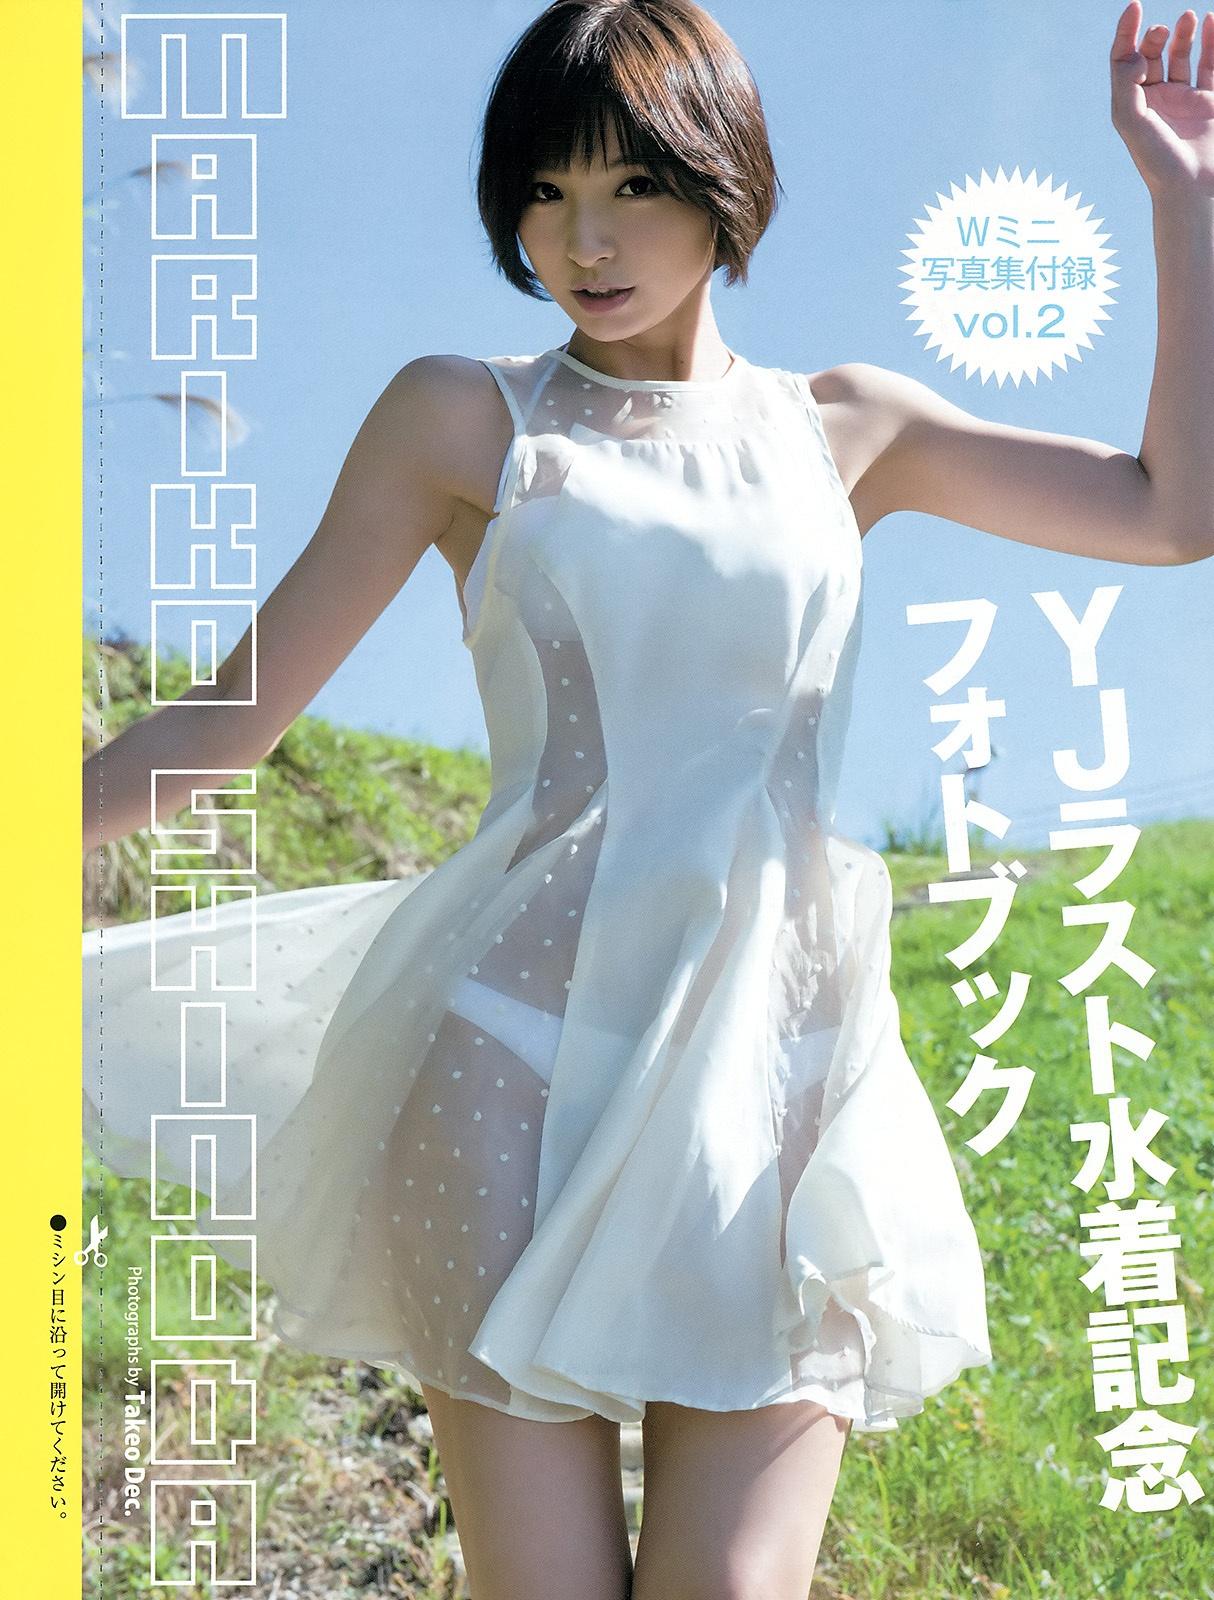 Shinoda Mariko Android Iphone Wallpaper 38437 Asiachan